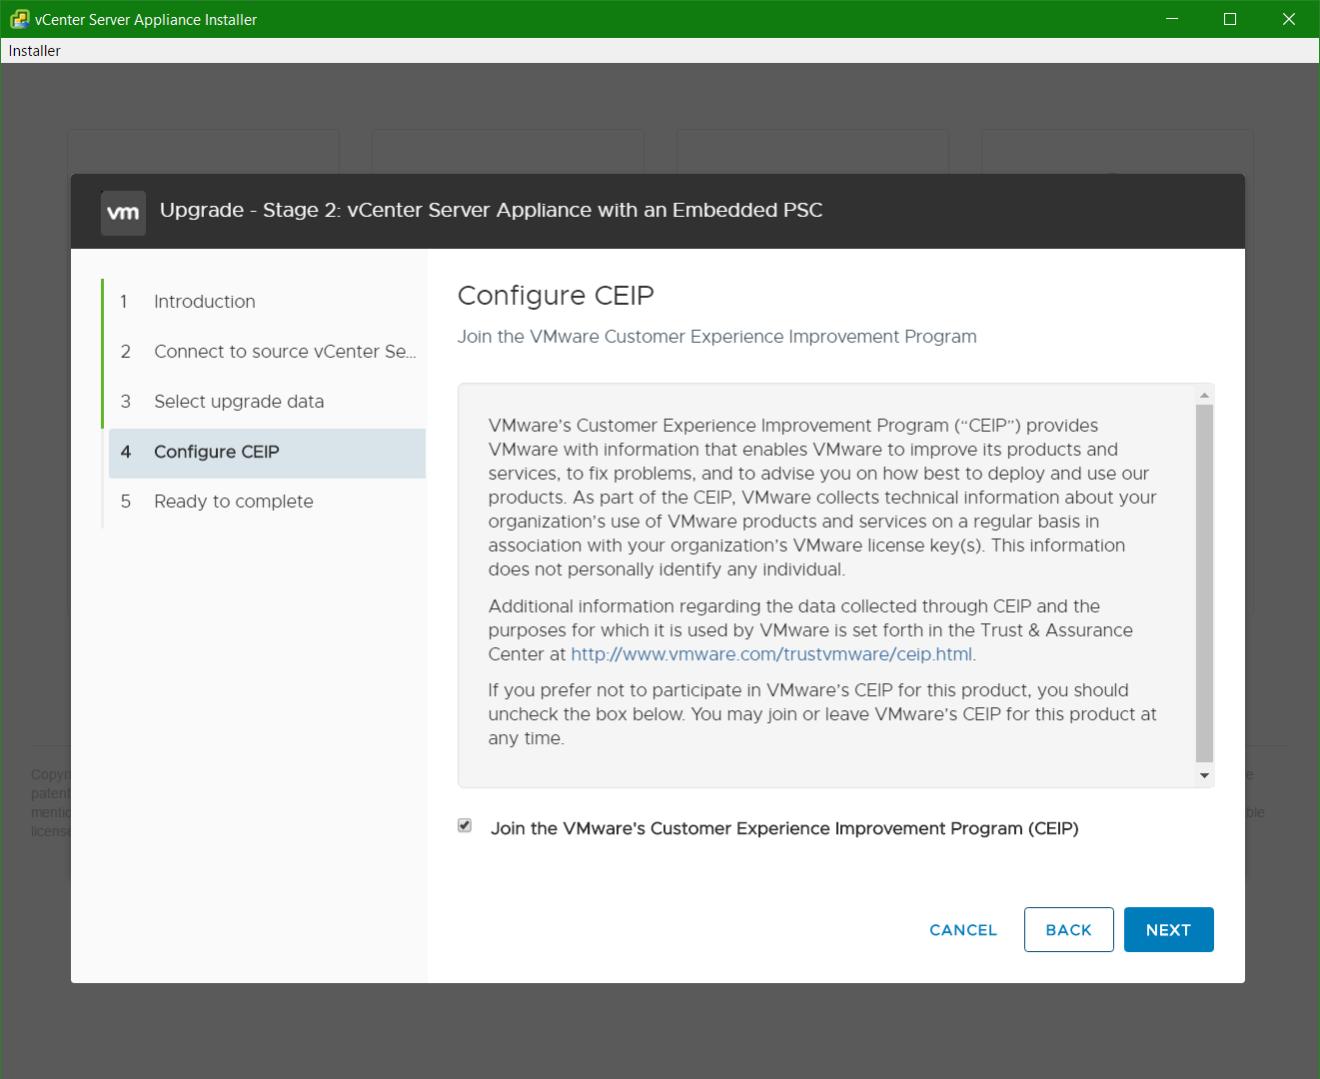 domalab.com vmware vcsa upgrade stage 2 ceip